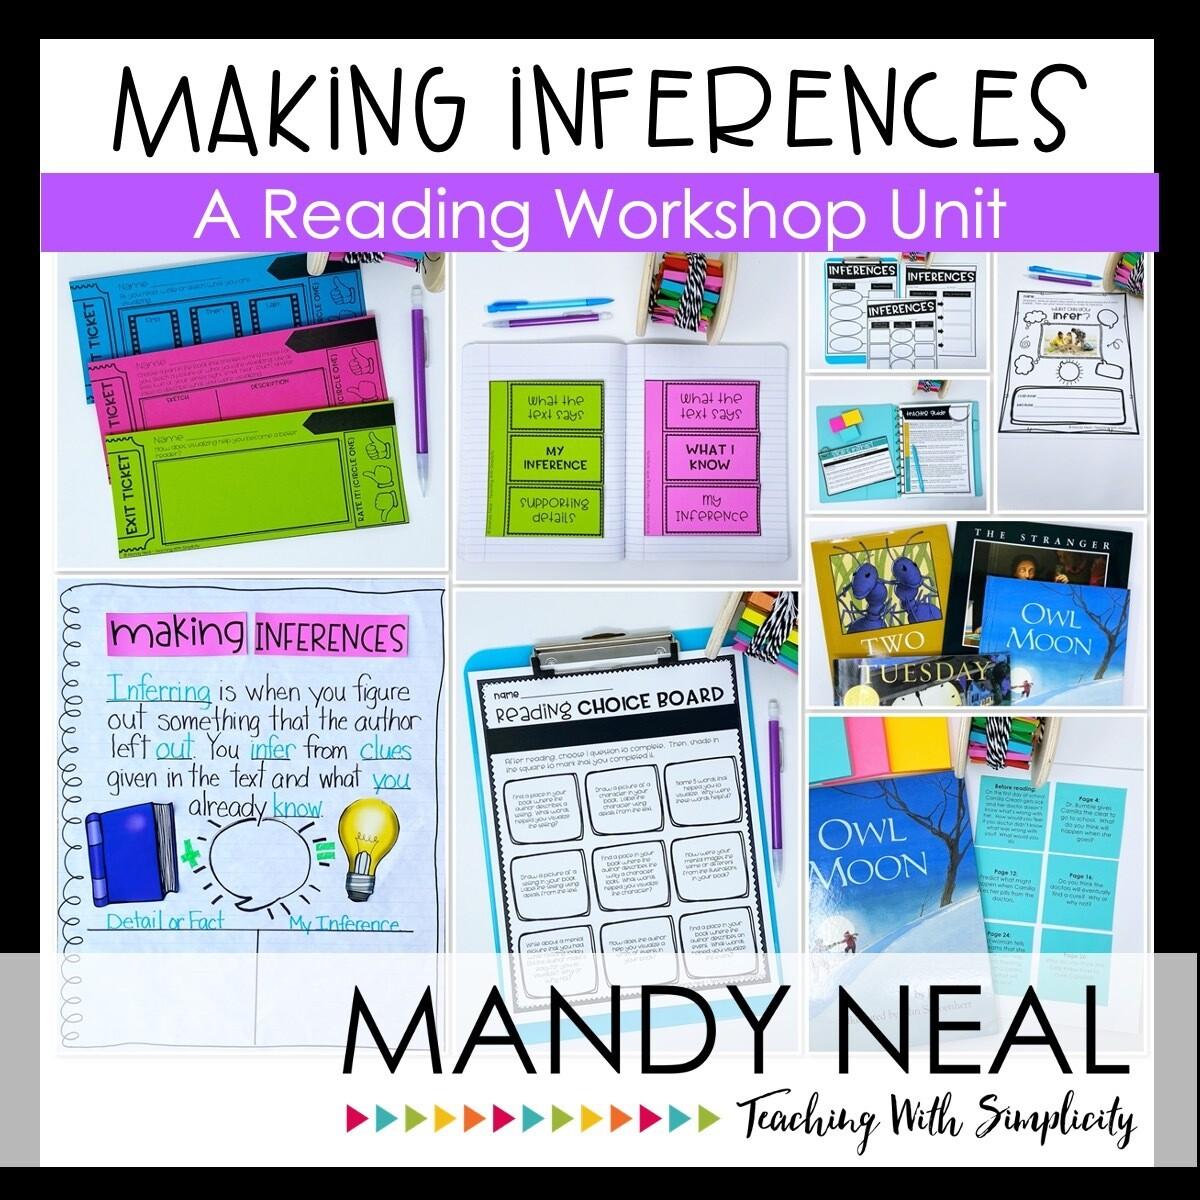 Making Inferences Reading Workshop Unit (Printable)